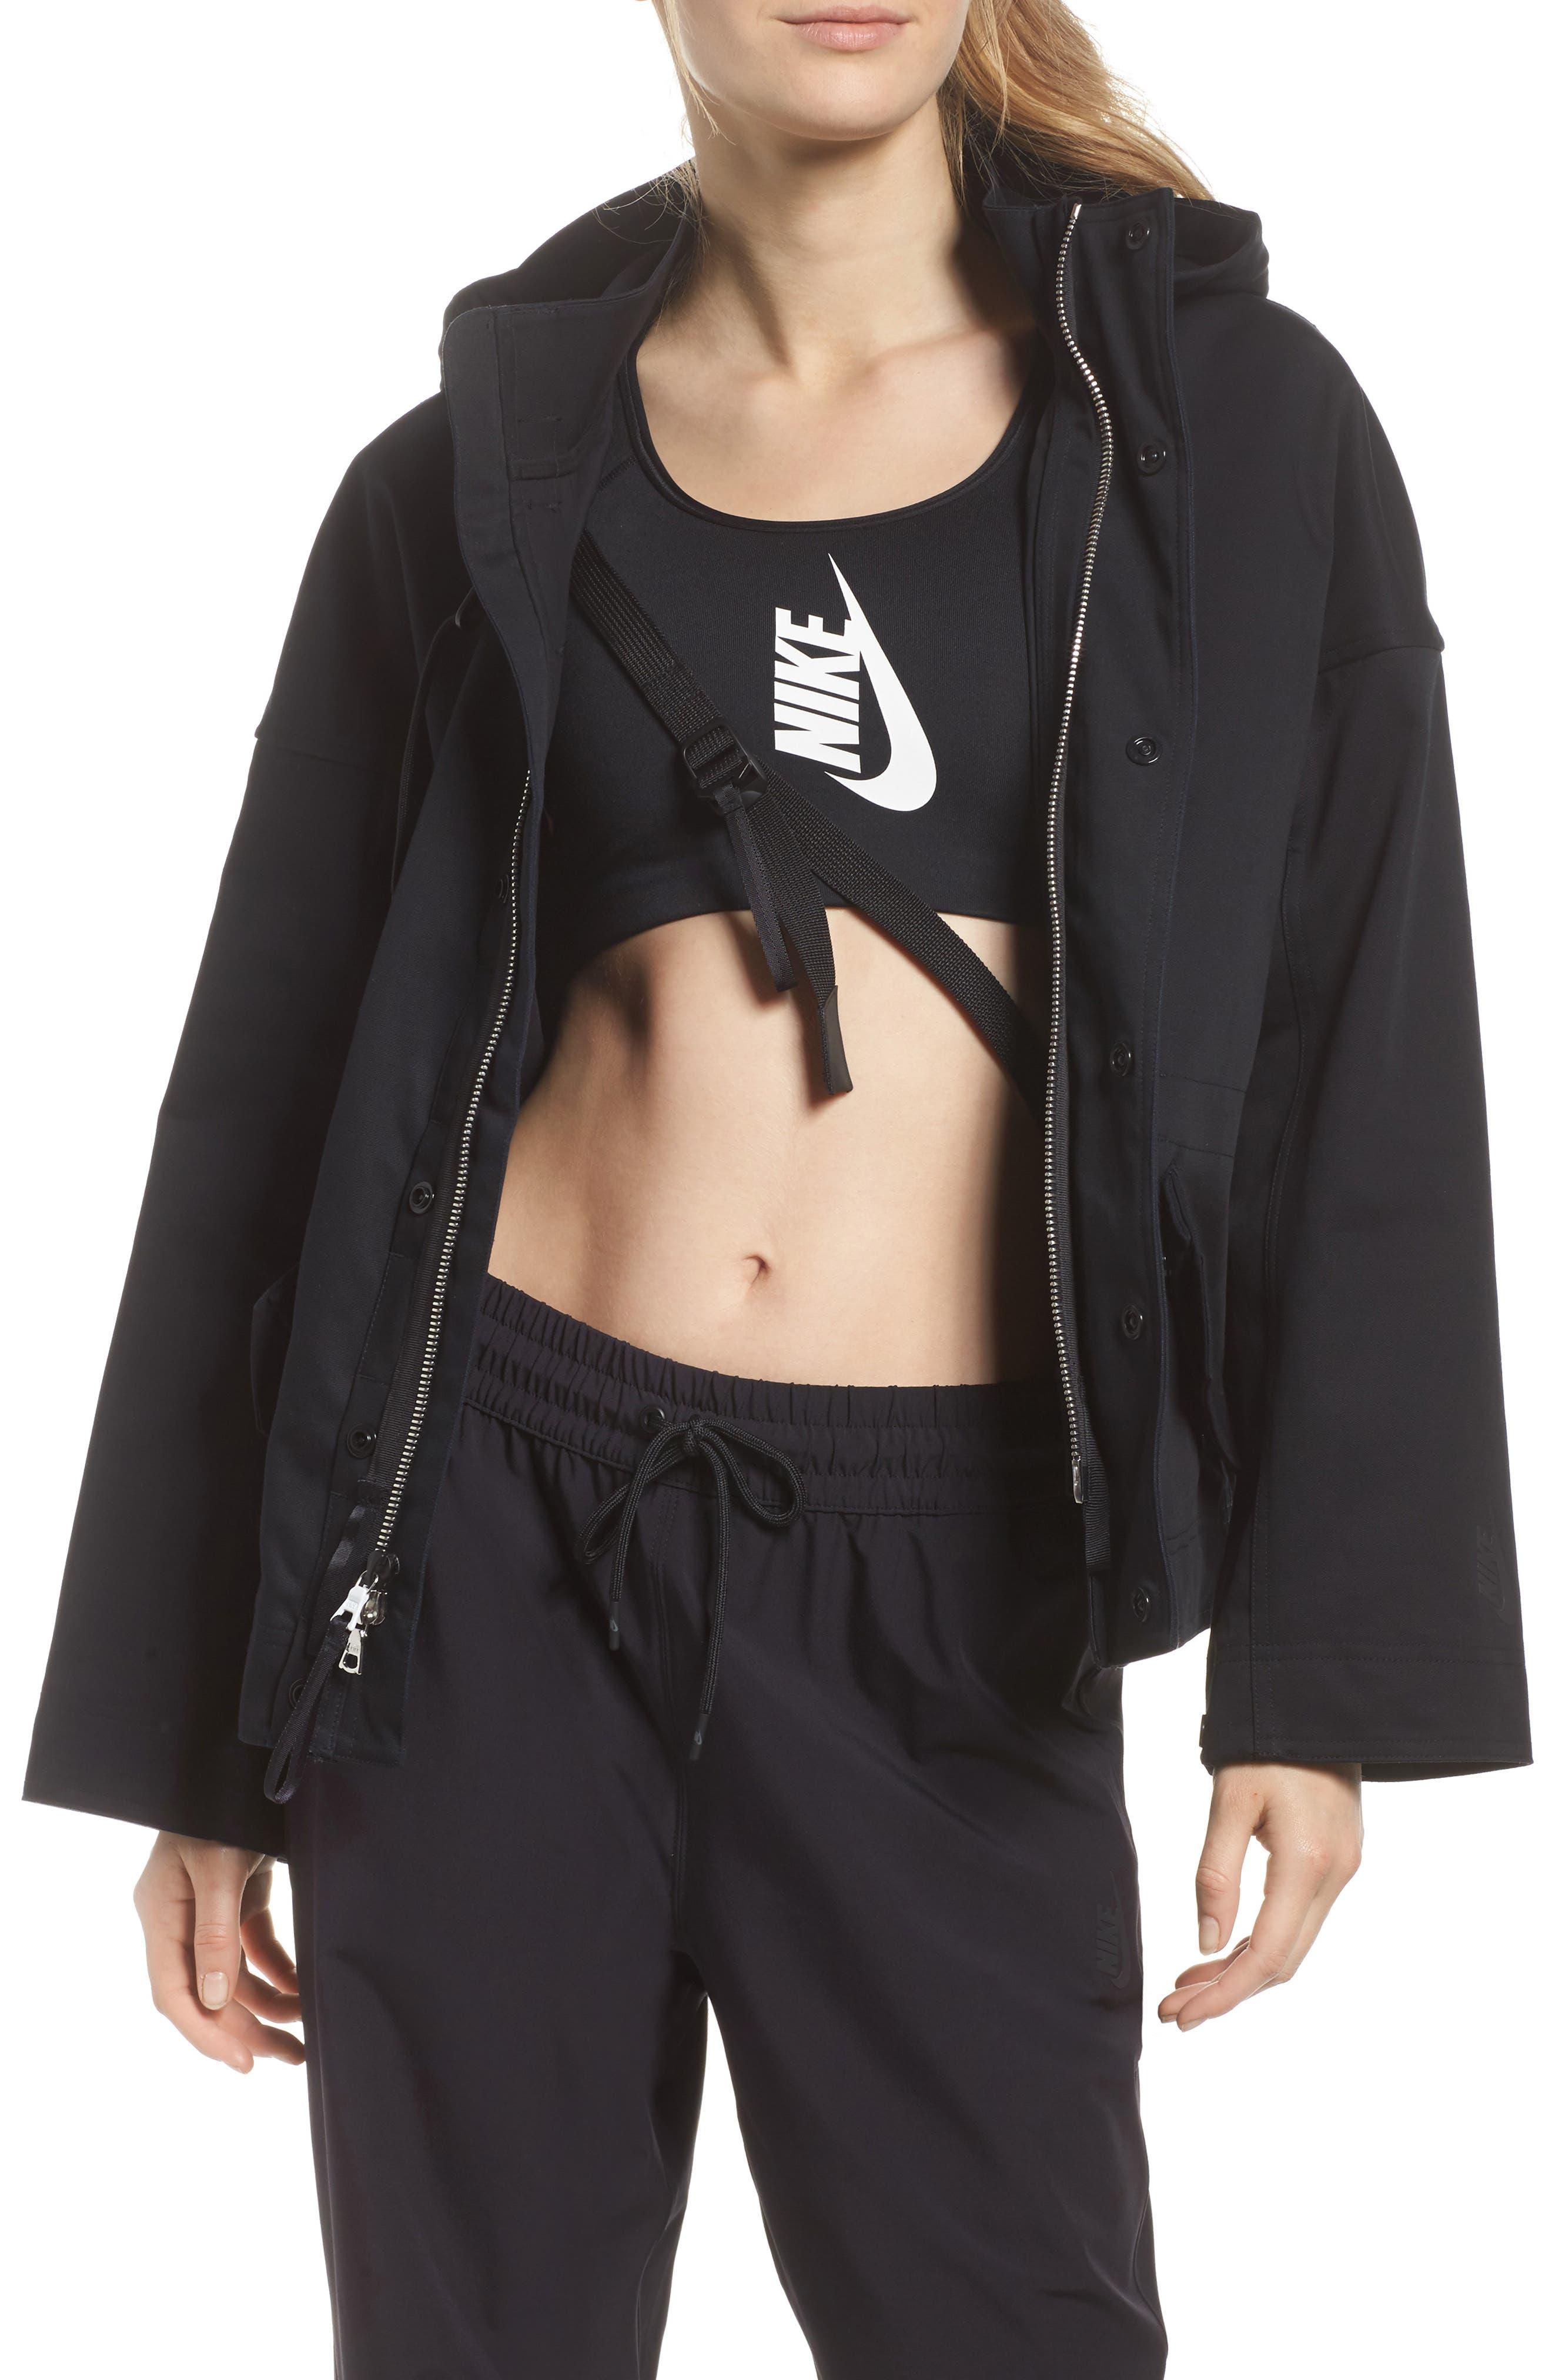 NikeLab Collection Women's Tactical Jacket,                             Alternate thumbnail 4, color,                             Black/ Black